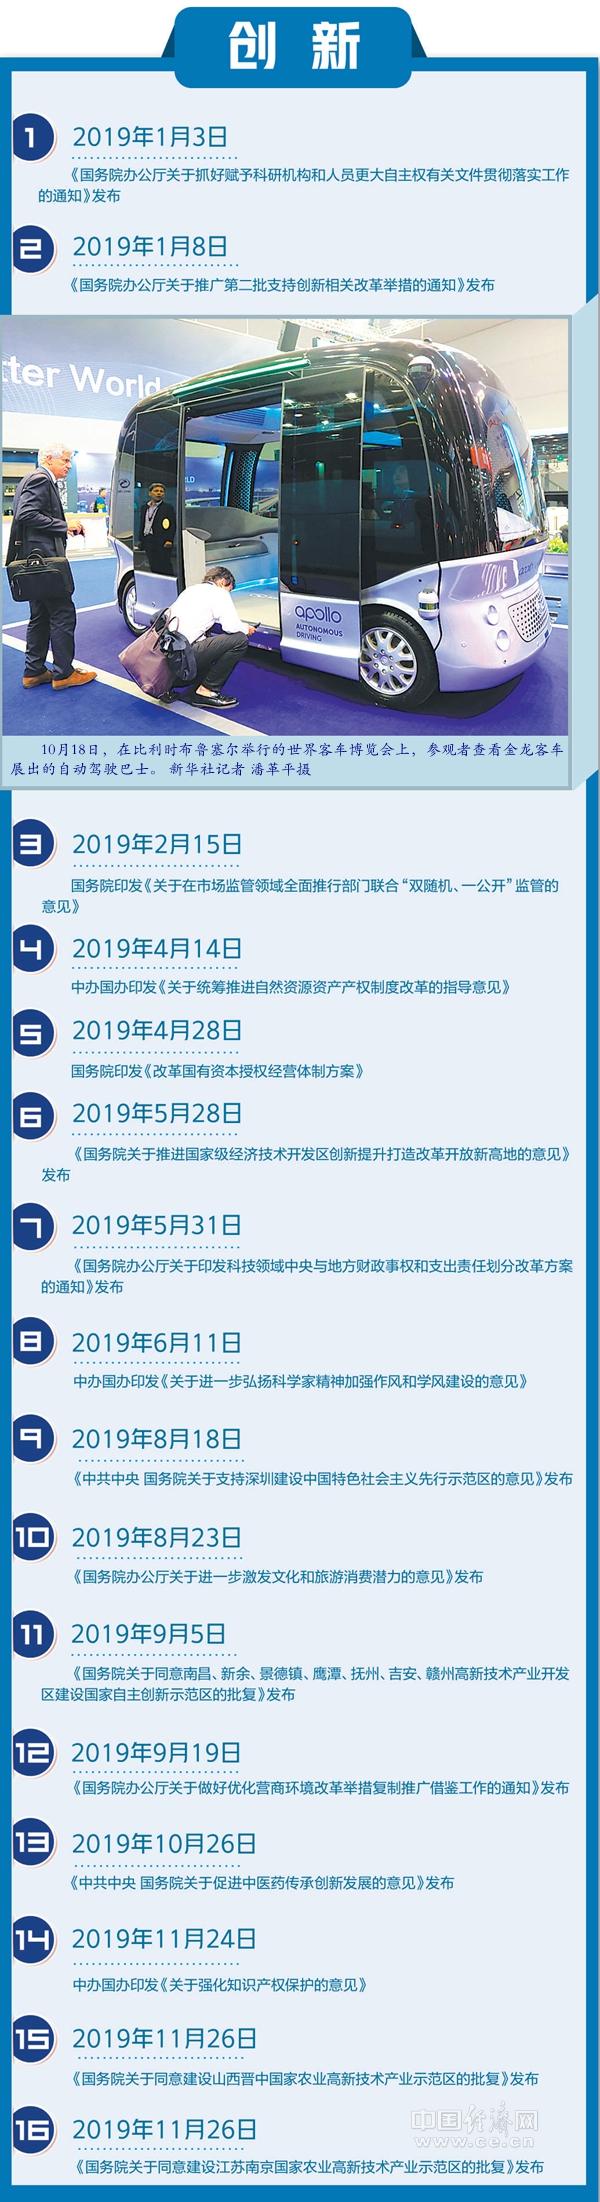 fanuc数控系统推动中国经济巨轮破浪前行——20